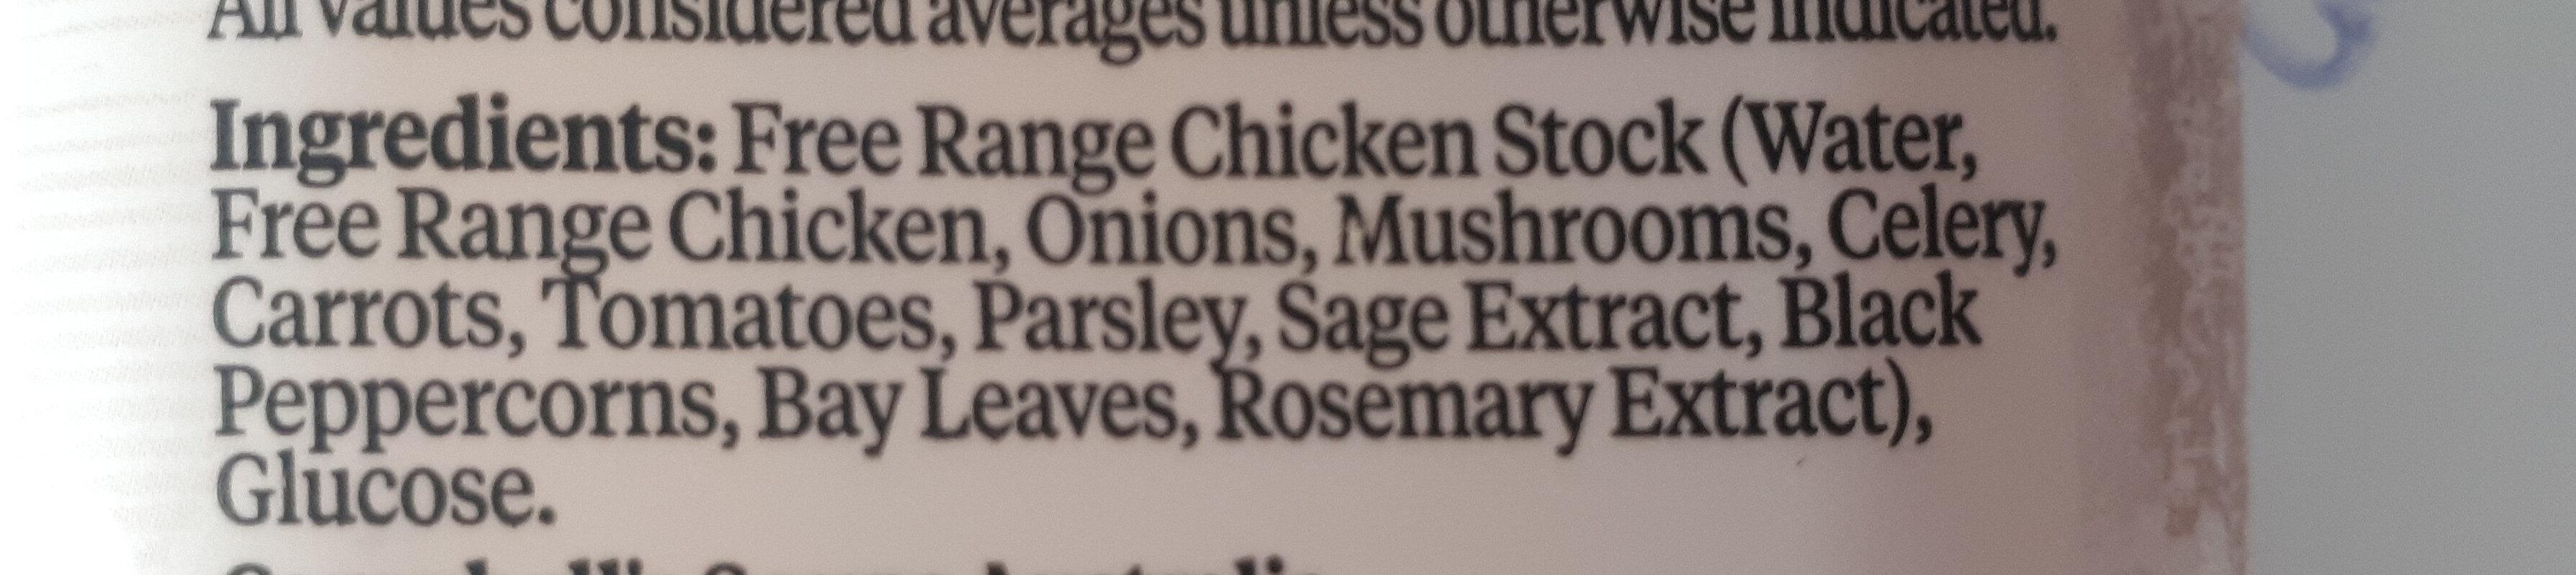 Free Range Chicken Stock - Ingredients